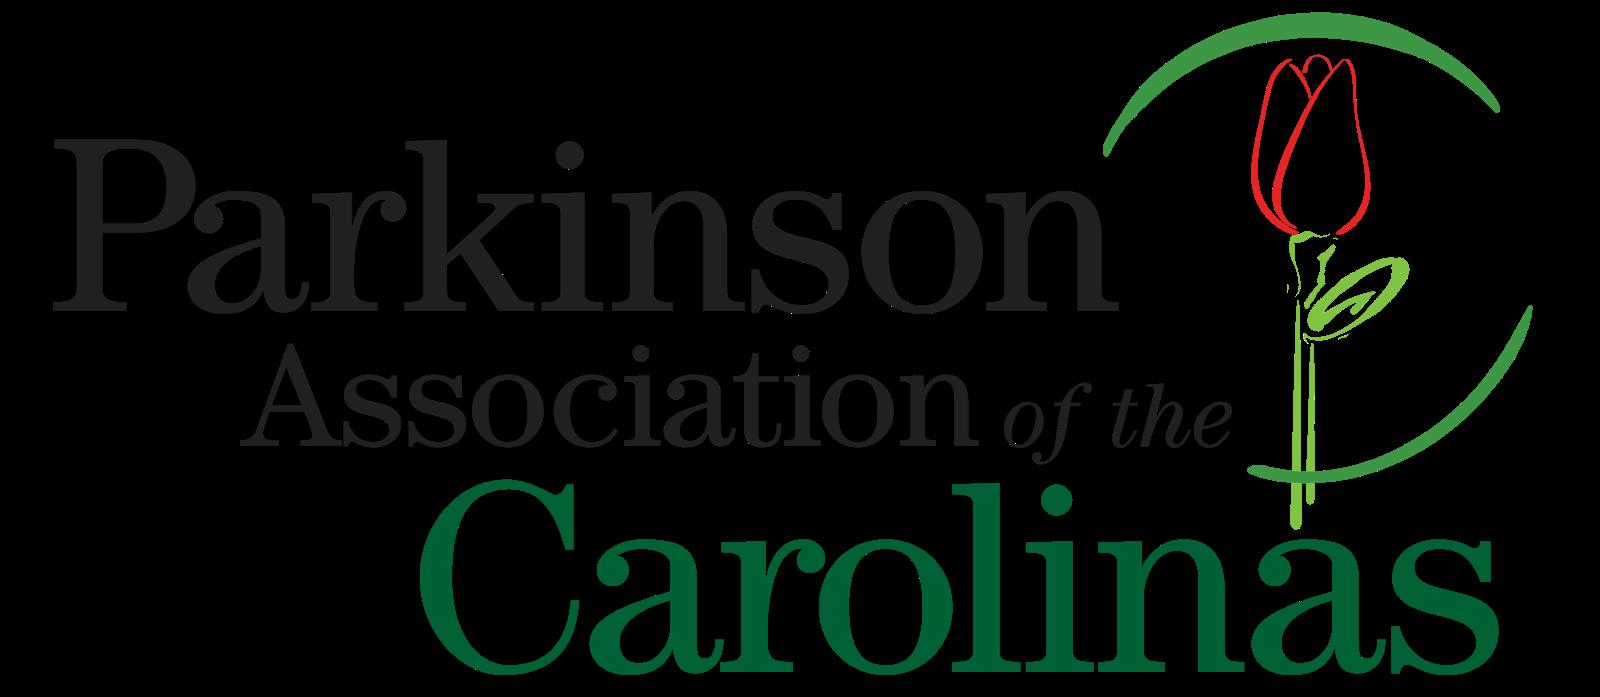 Parkinson Association of the Carolinas